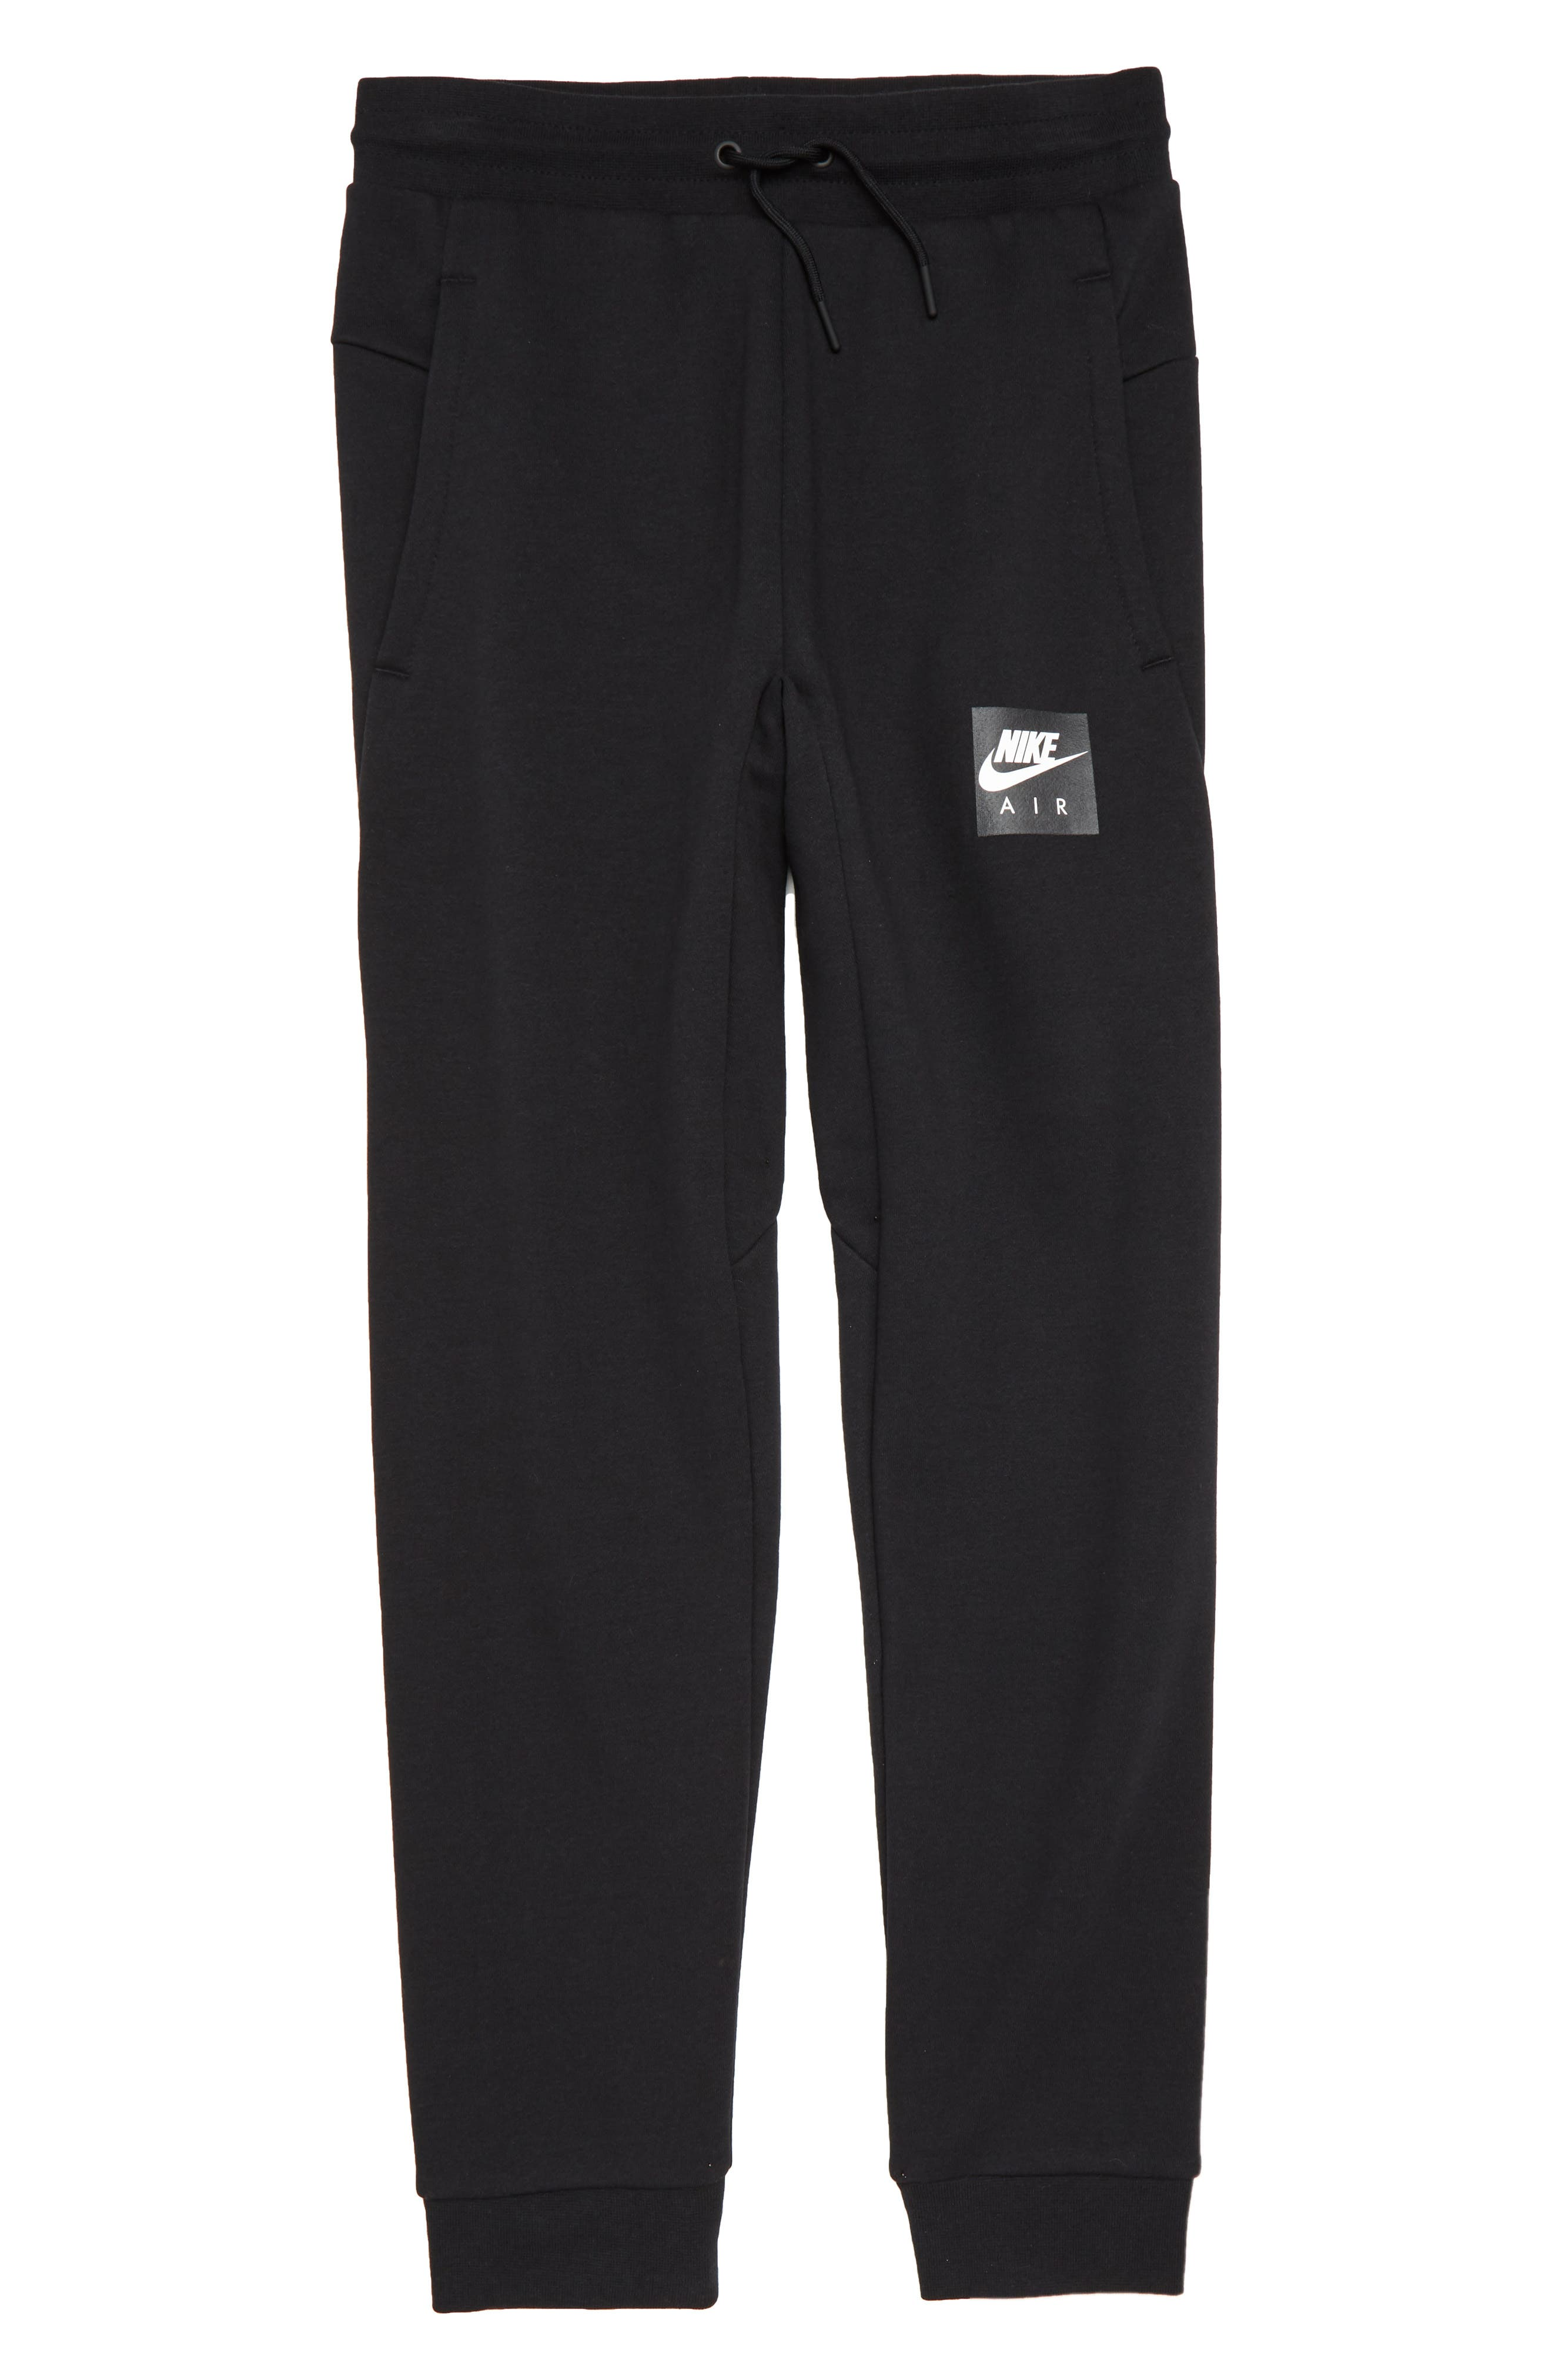 Air Fleece Jogger Pants,                             Main thumbnail 1, color,                             Black